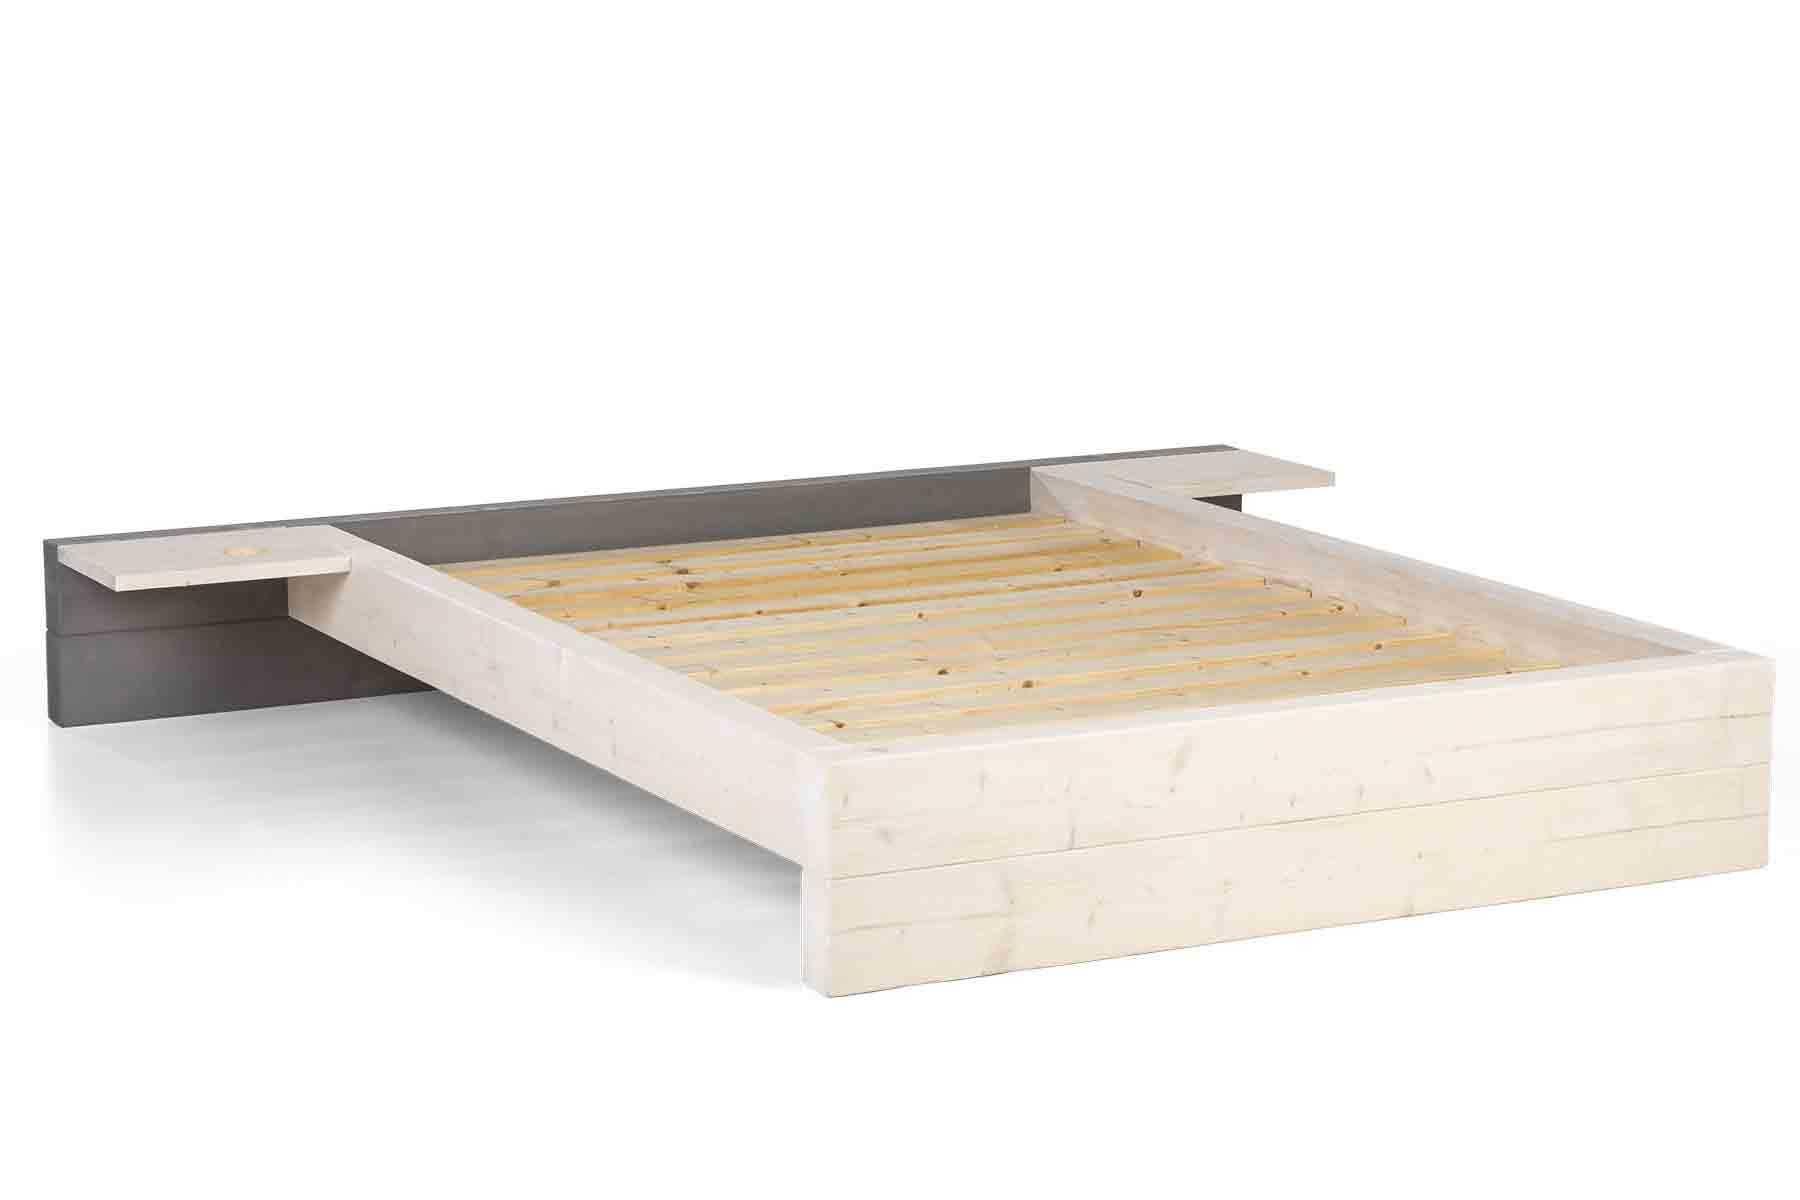 Bett Franz Selber Bauen Alle Mobel Create By Obi In 2020 Bett Selber Bauen Selber Bauen Massiv Bett